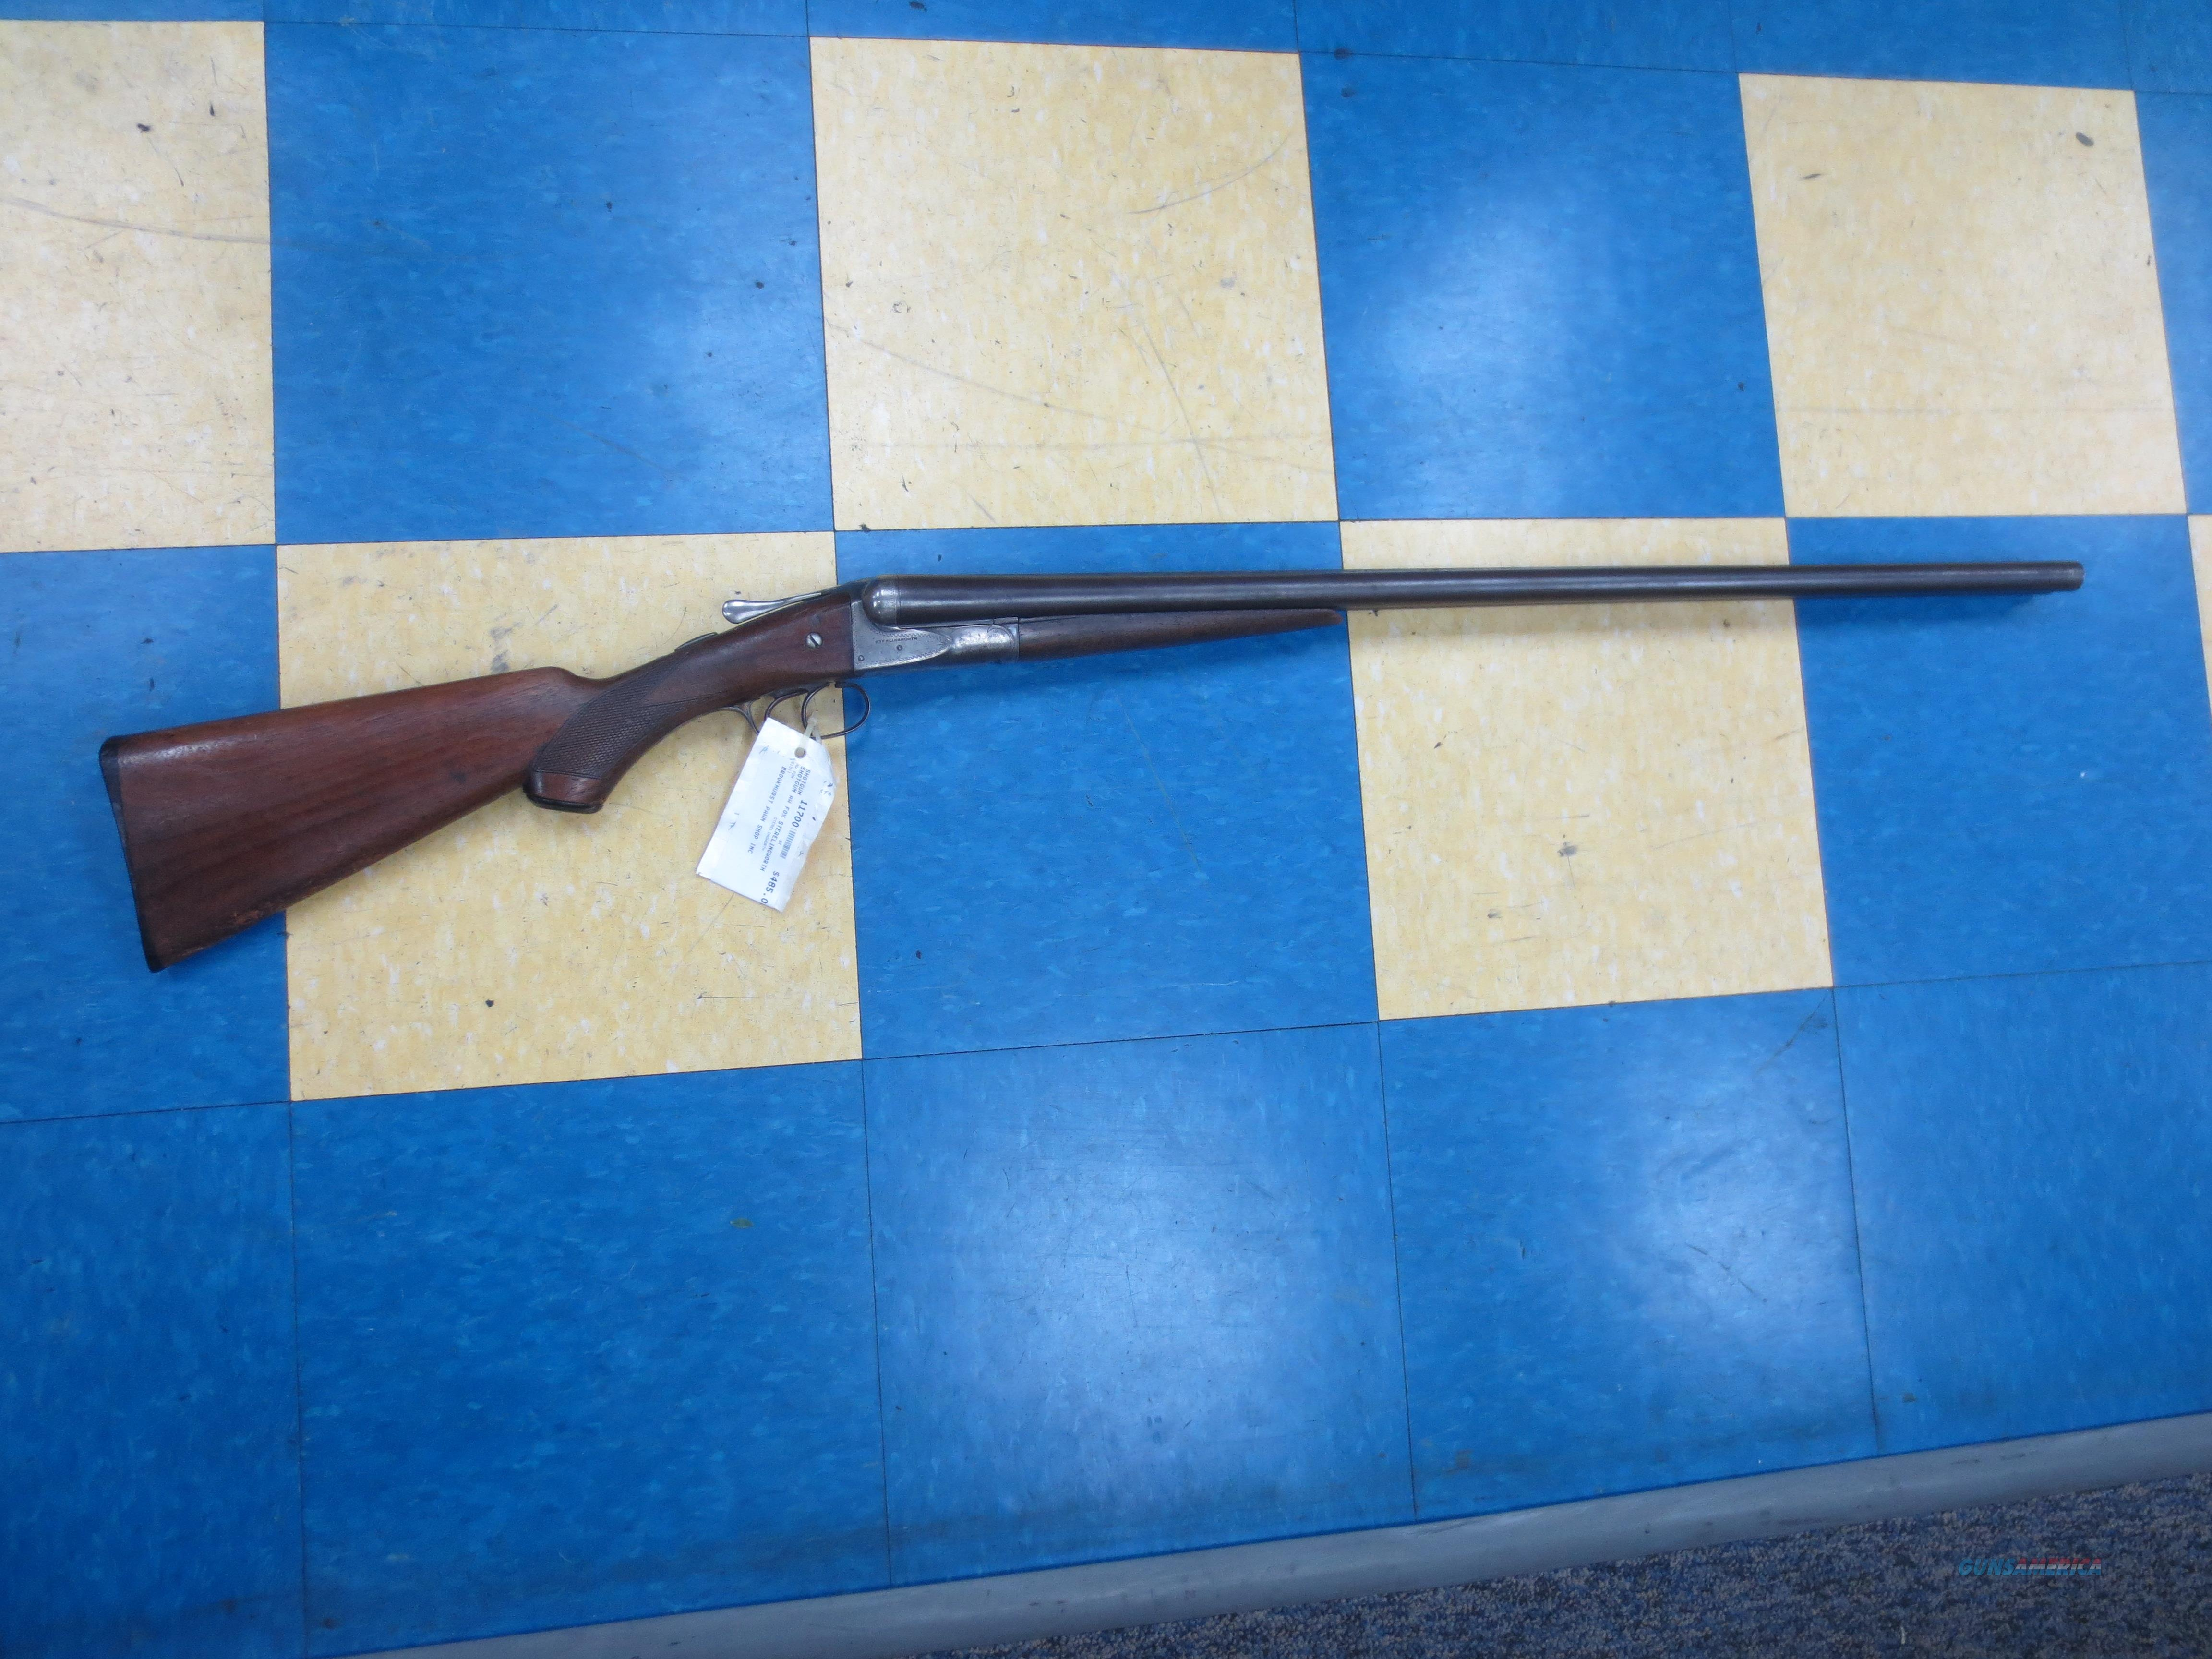 AW Fox Sterlingworth SxS 12 gauge sotgun  Guns > Shotguns > Fox Shotguns